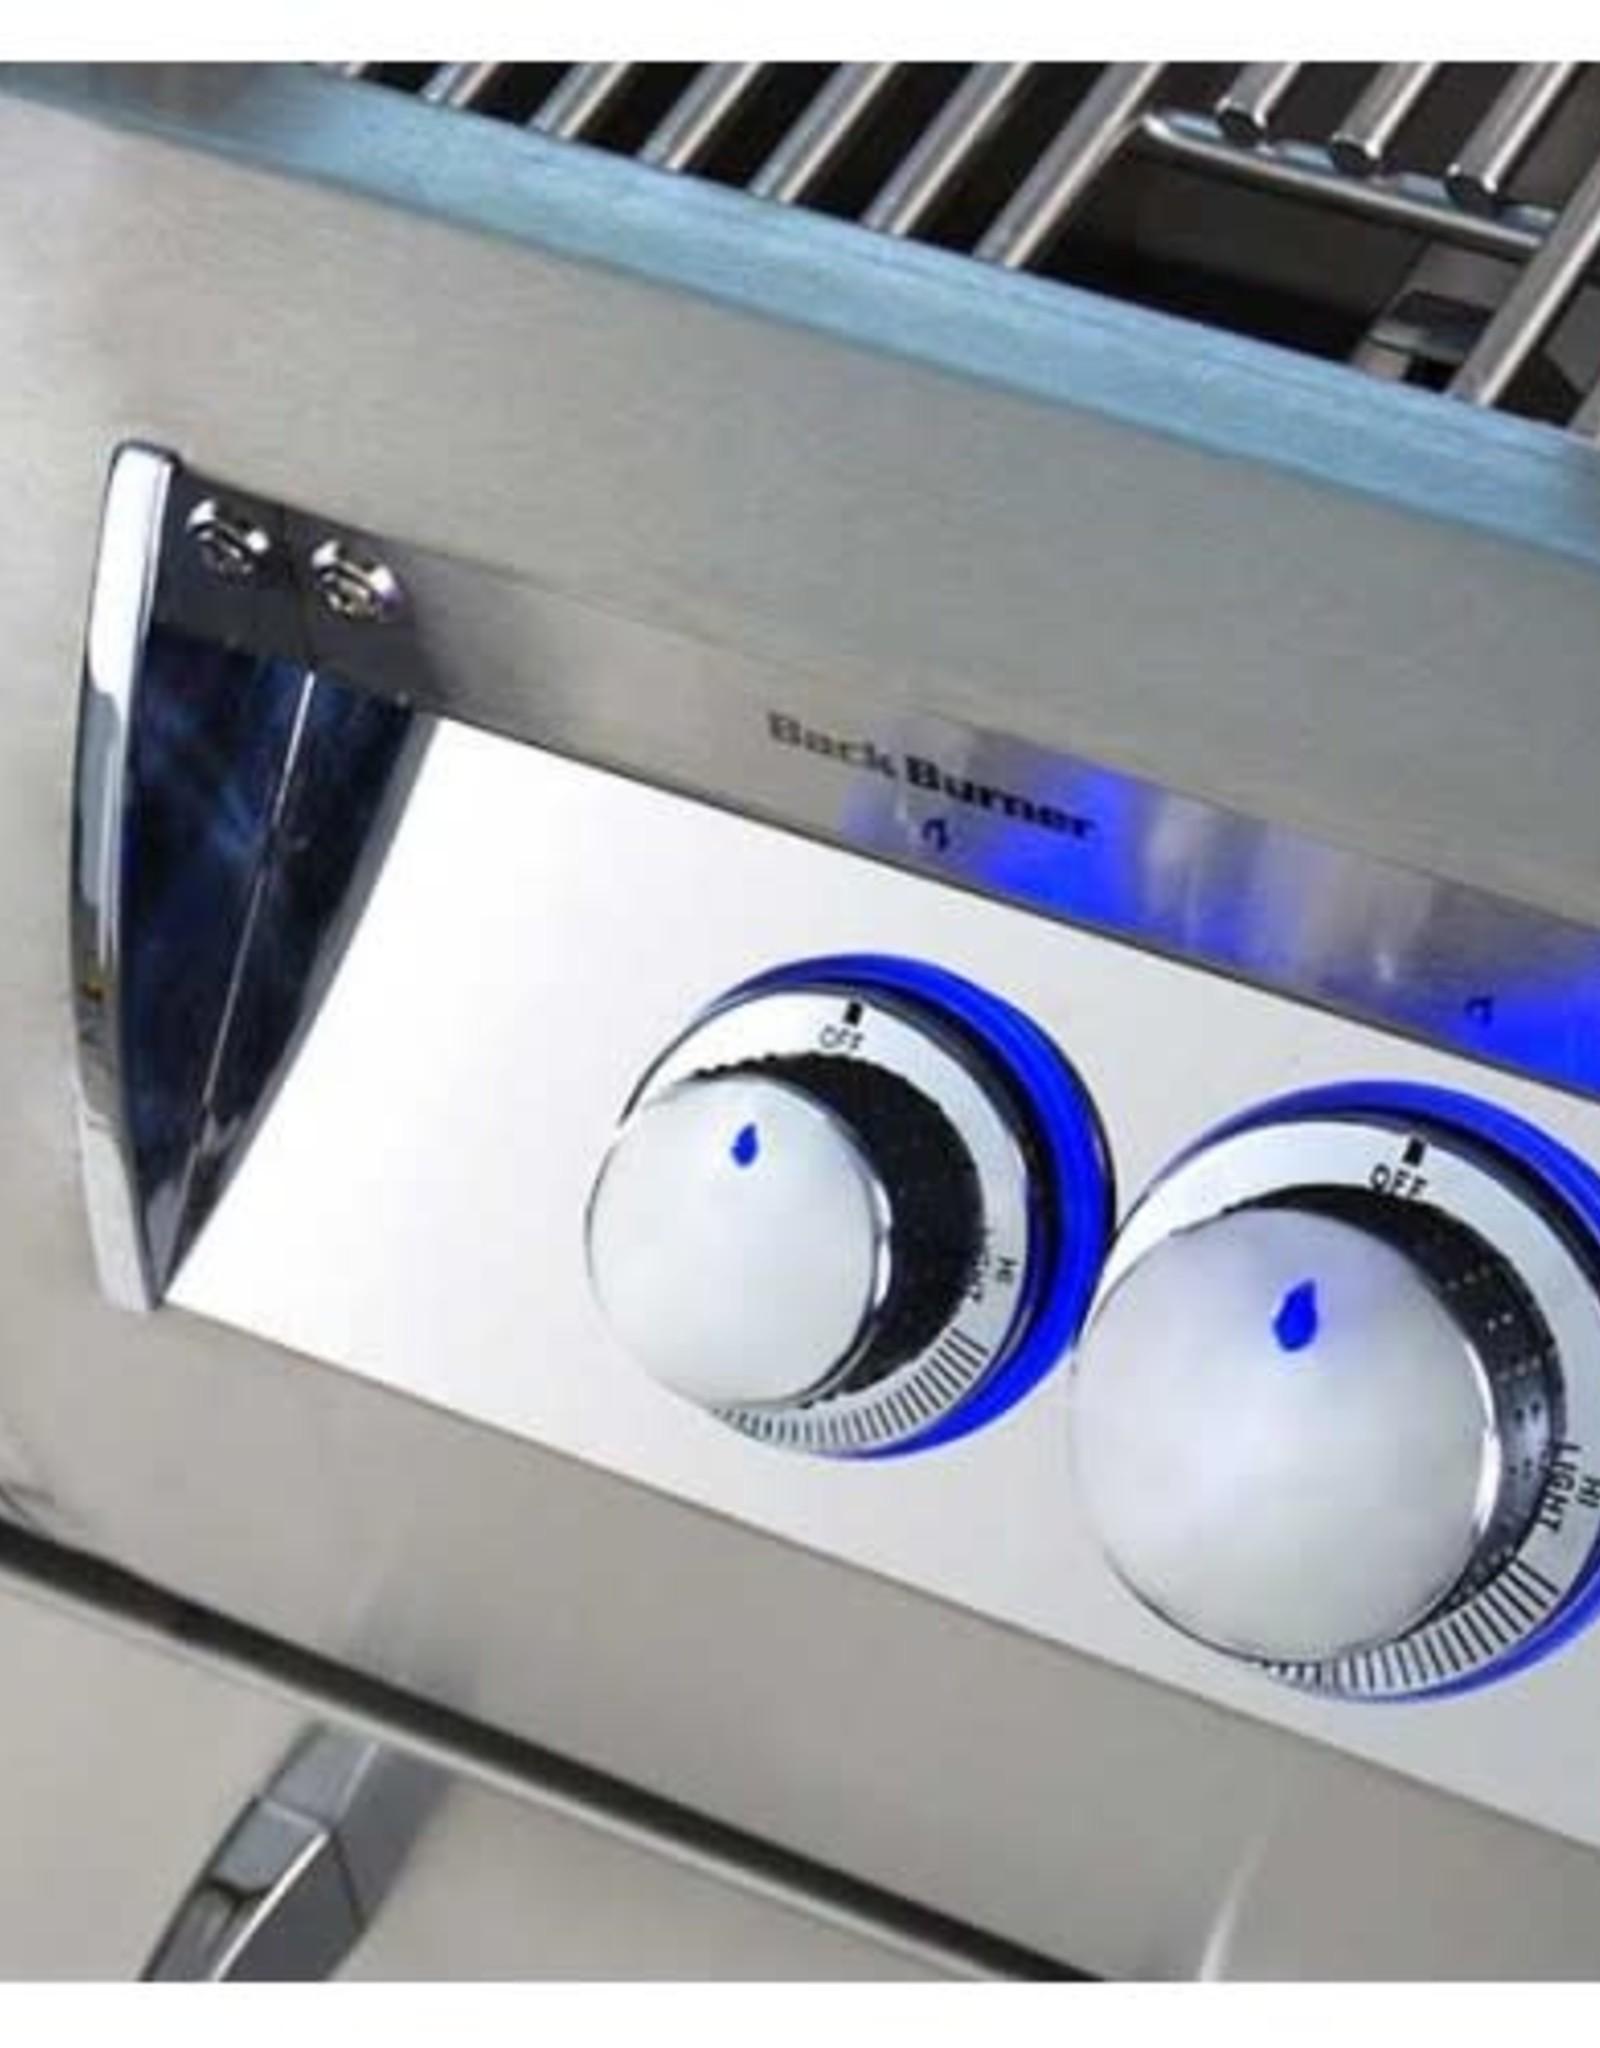 Fire Magic Fire Magic - Aurora A540i 30-inch Built-In Grill With Rotisserie